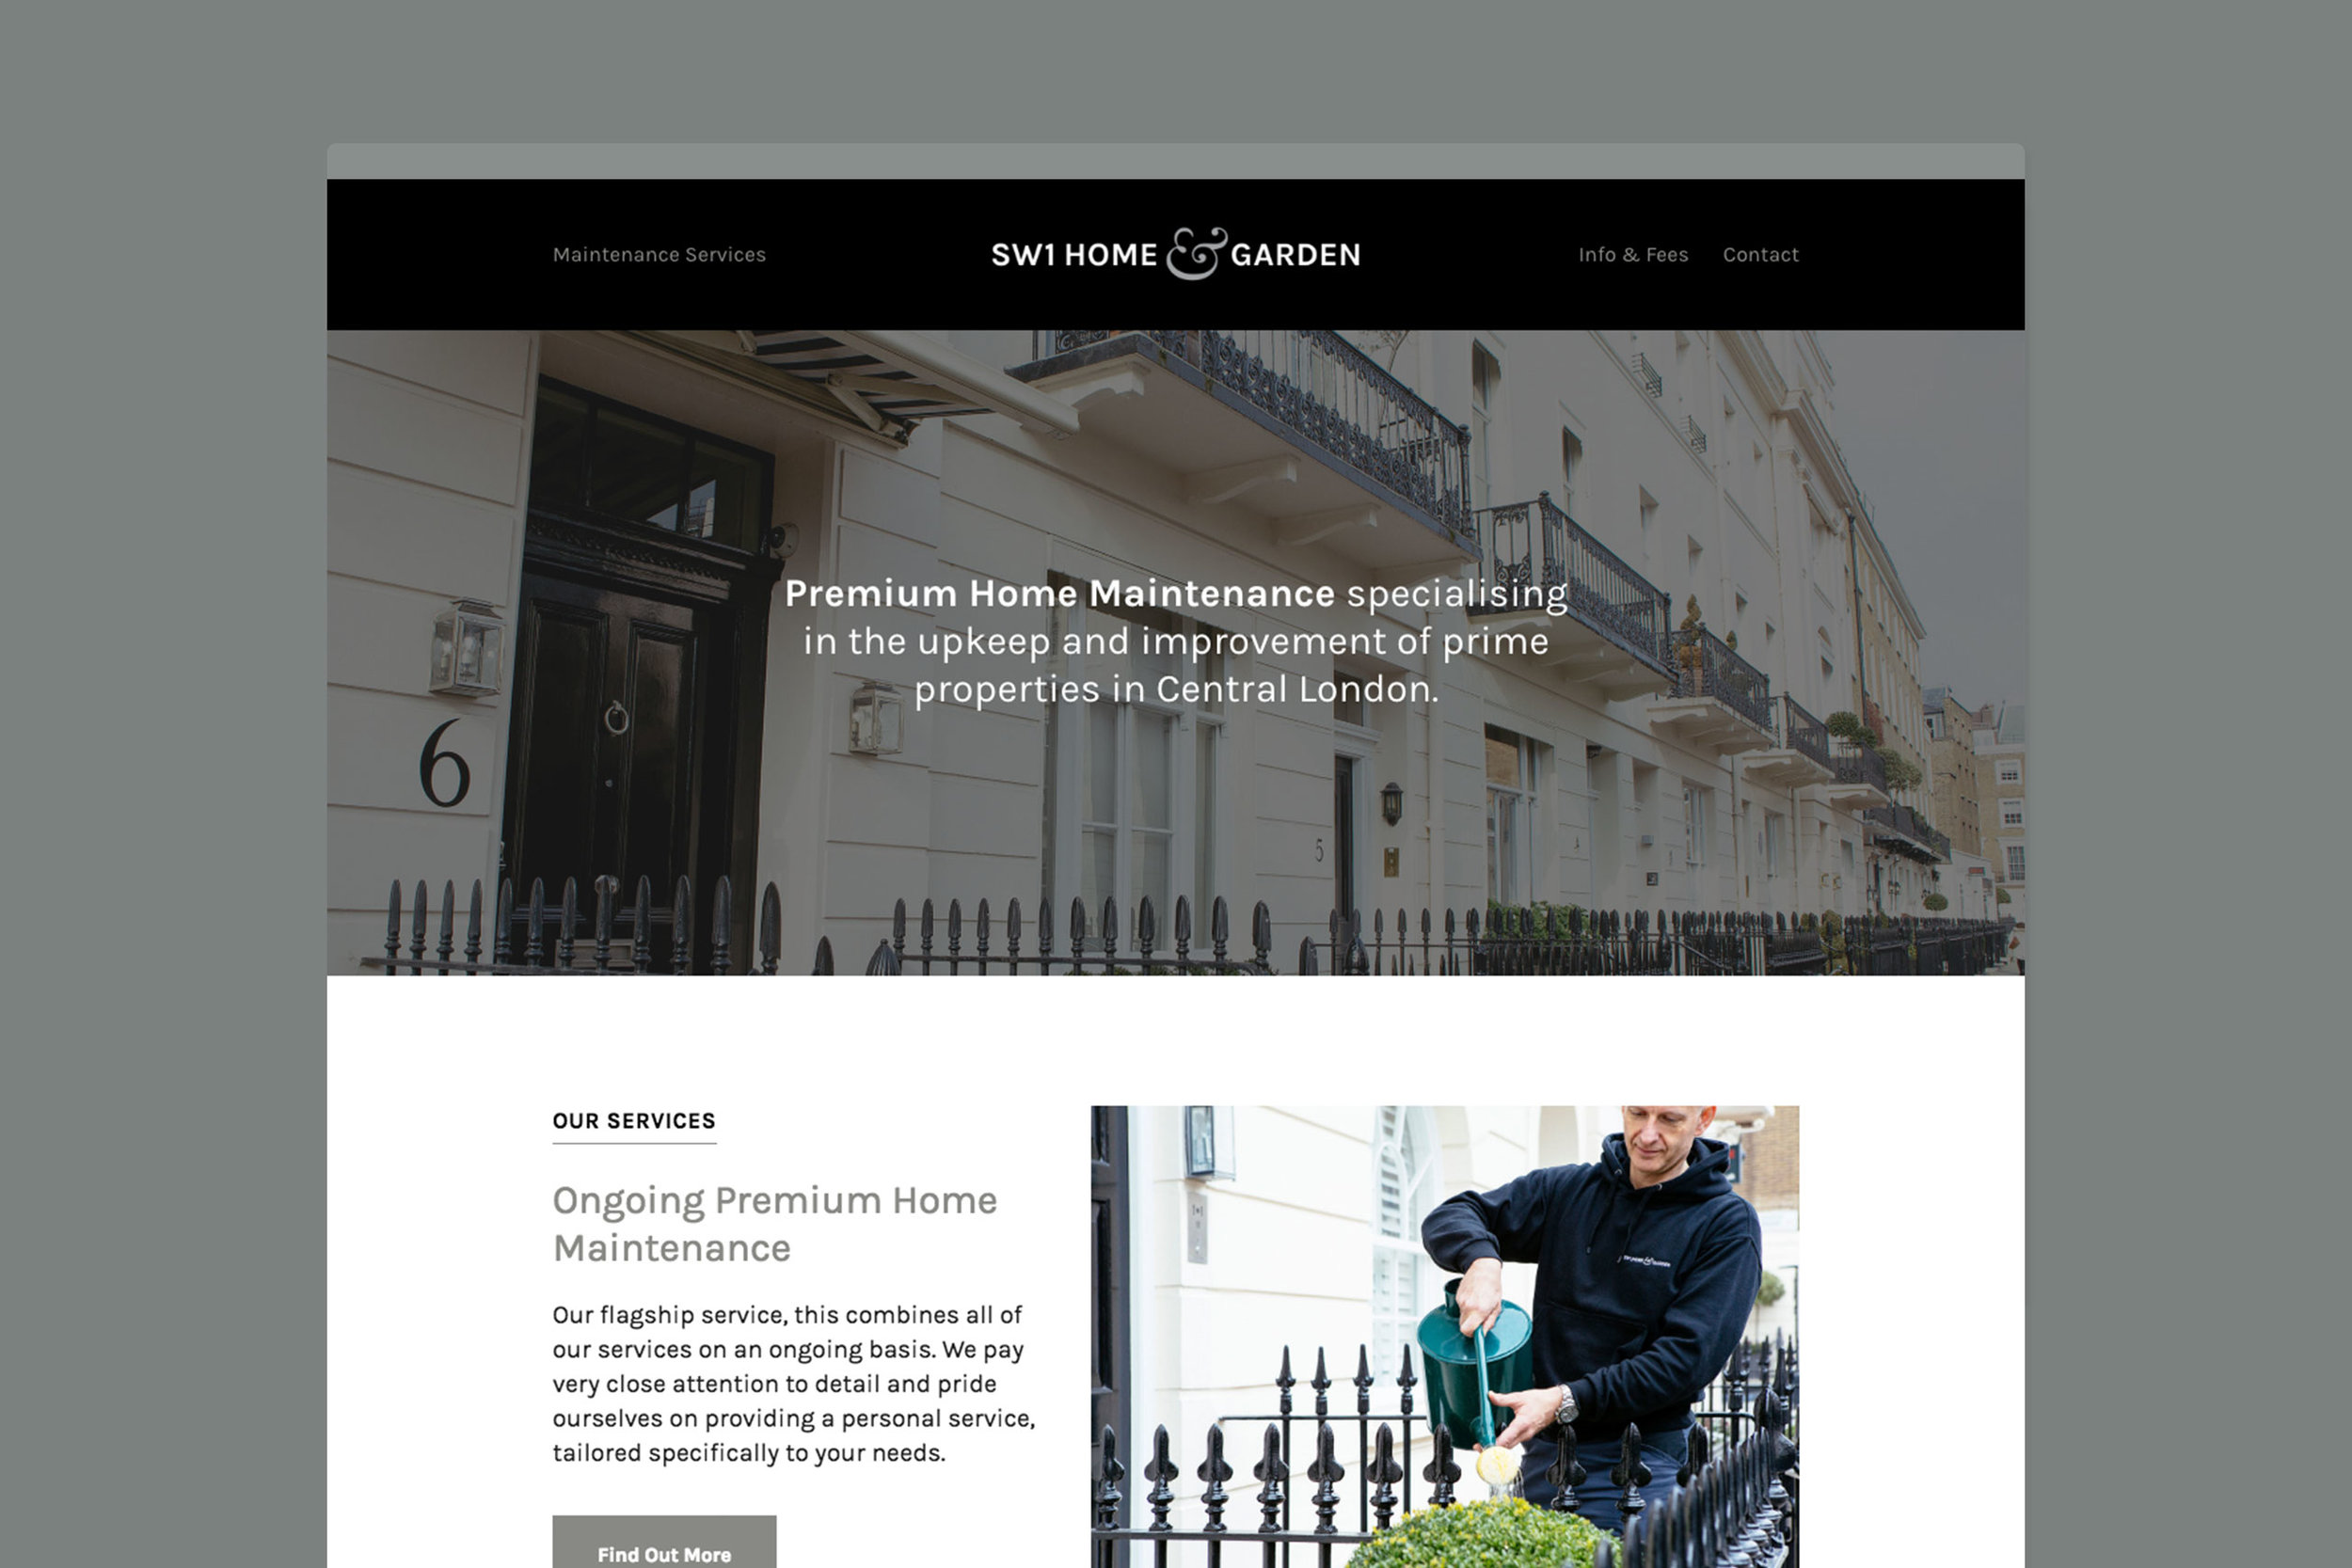 Clean custom web design for SW1 Home & Garden